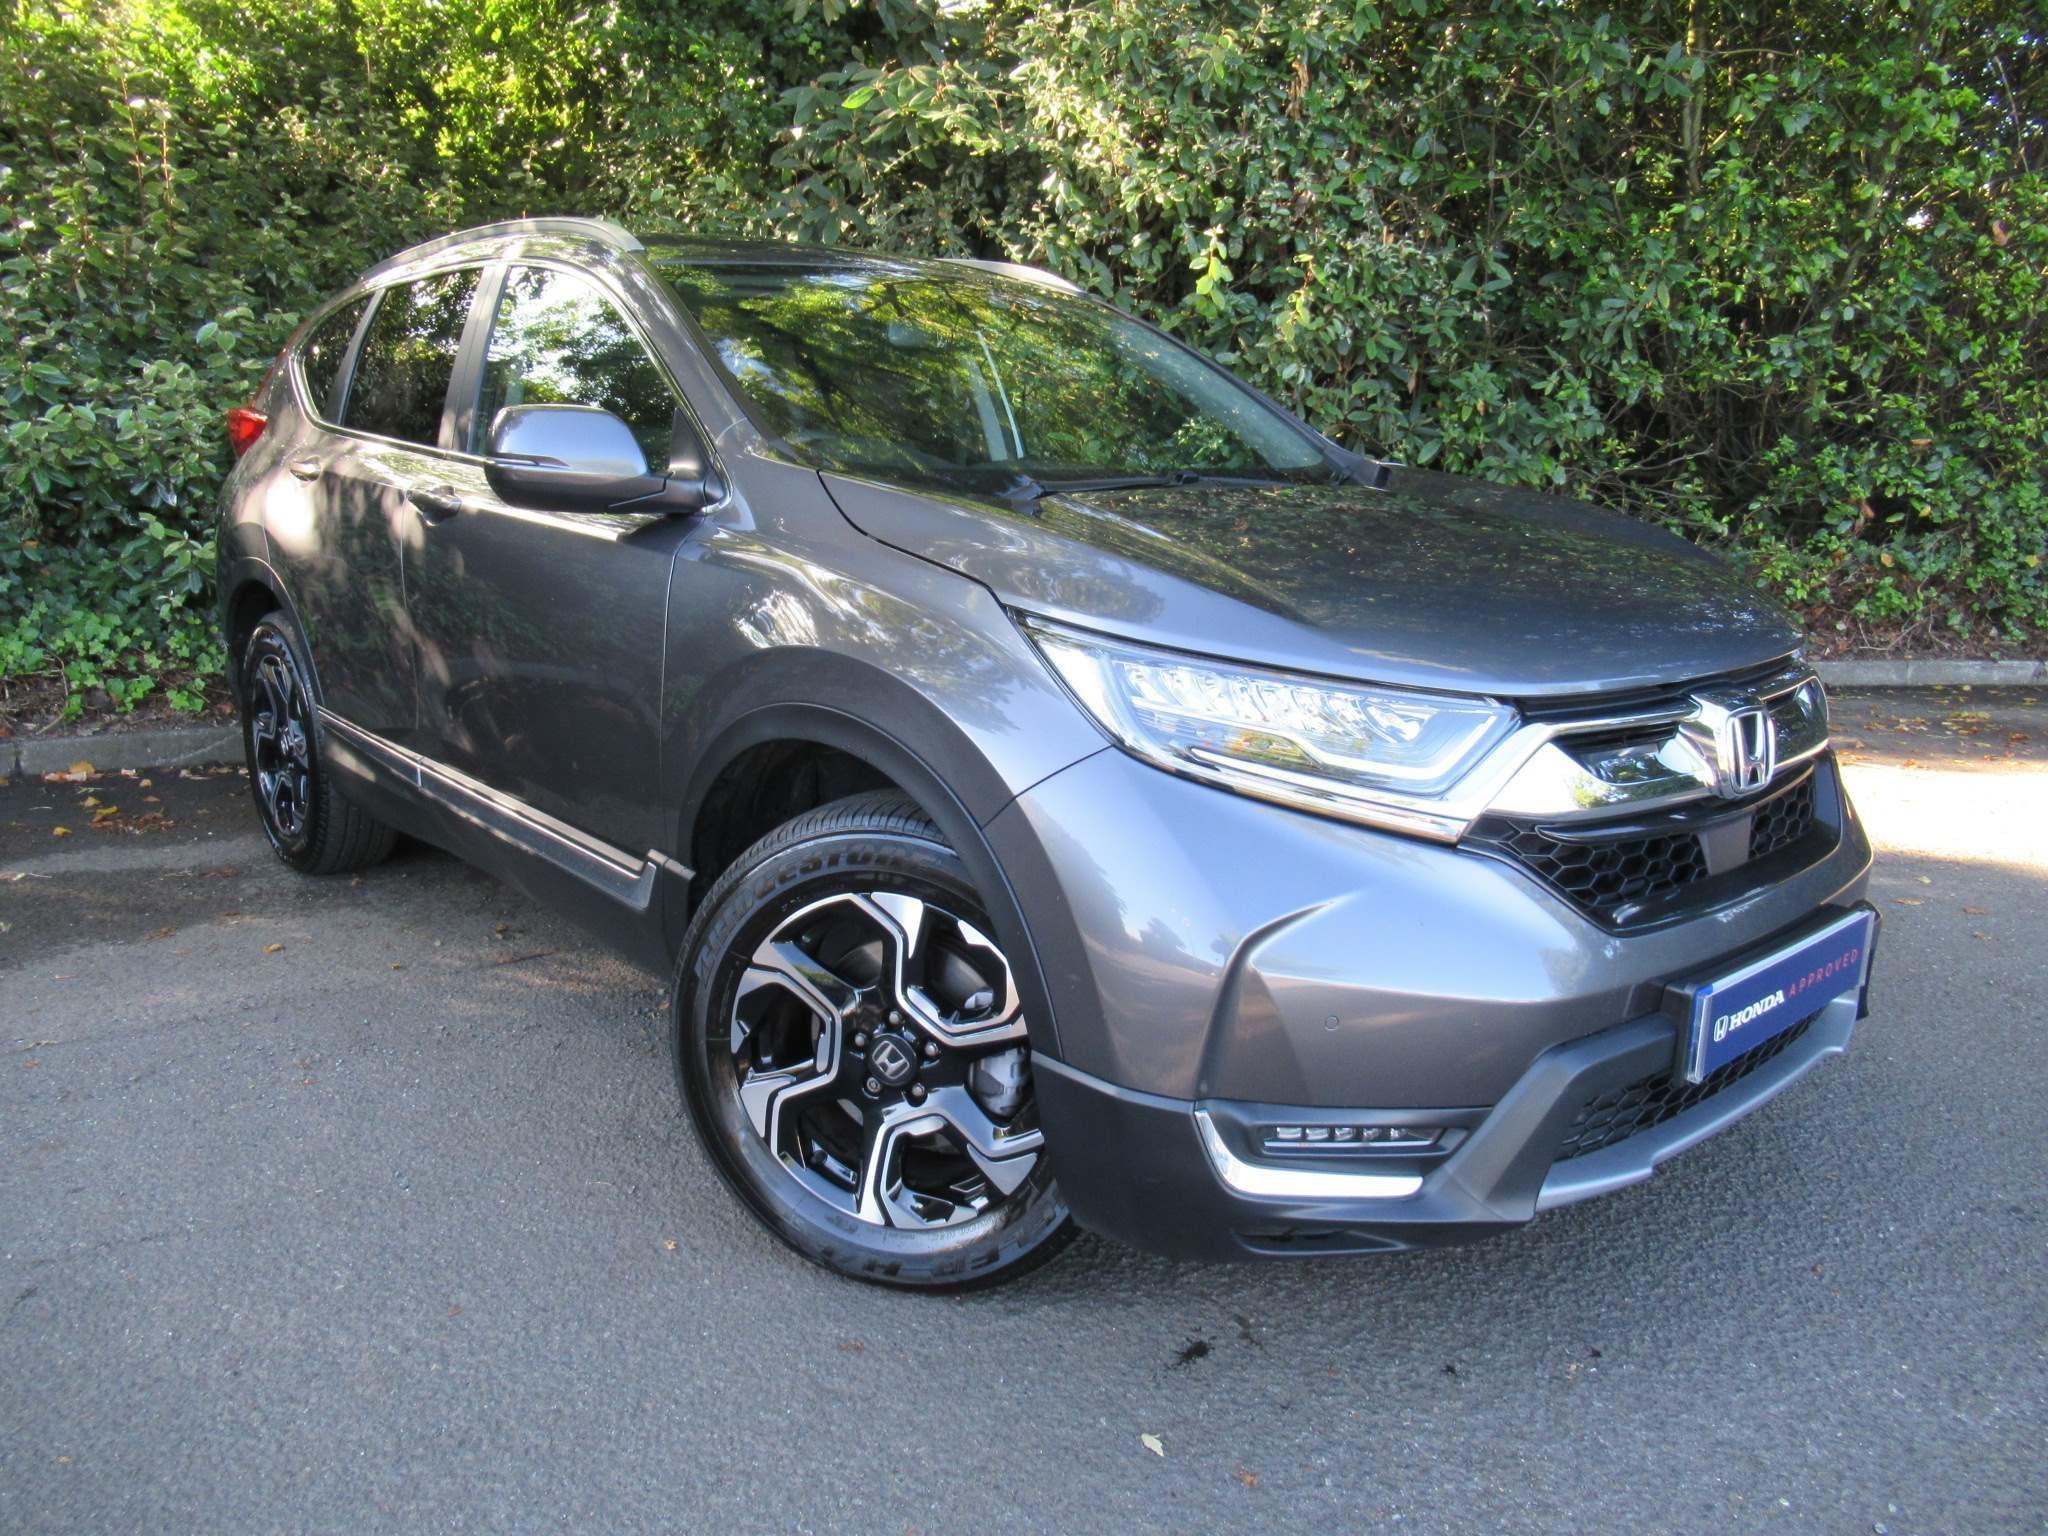 Honda CR-V 1.5 VTEC Turbo SR 4WD (s/s) 5dr